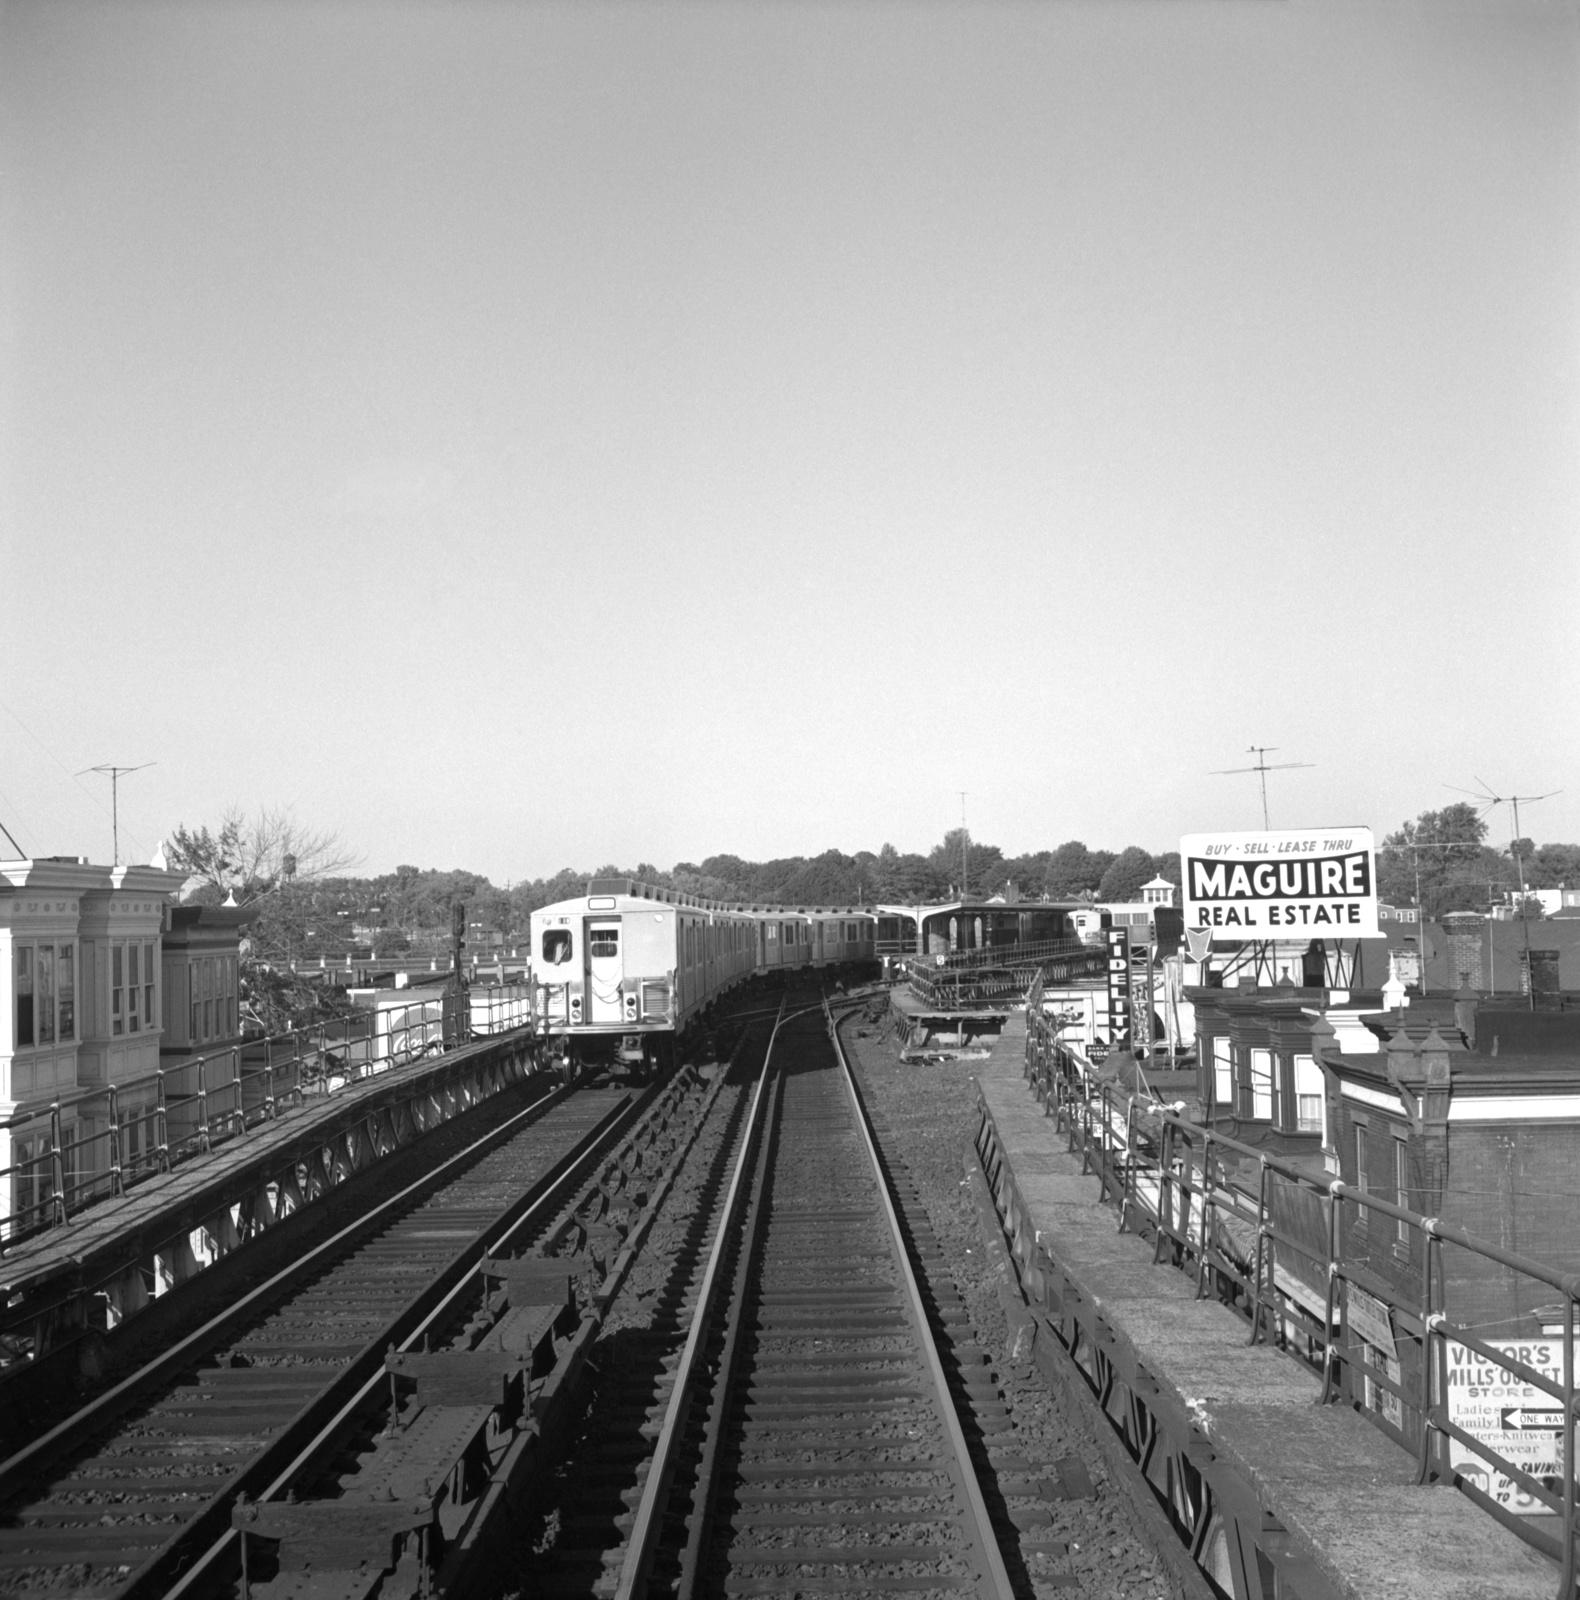 (664k, 1580x1600)<br><b>Country:</b> United States<br><b>City:</b> Philadelphia, PA<br><b>System:</b> SEPTA (or Predecessor)<br><b>Line:</b> Market-Frankford El<br><b>Location:</b> Frankford Terminal (Bridge/Pratt)<br><b>Car:</b> SEPTA M-3 (Budd, 1960)  <br><b>Collection of:</b> David Pirmann<br><b>Date:</b> 10/2/1965<br><b>Viewed (this week/total):</b> 0 / 60